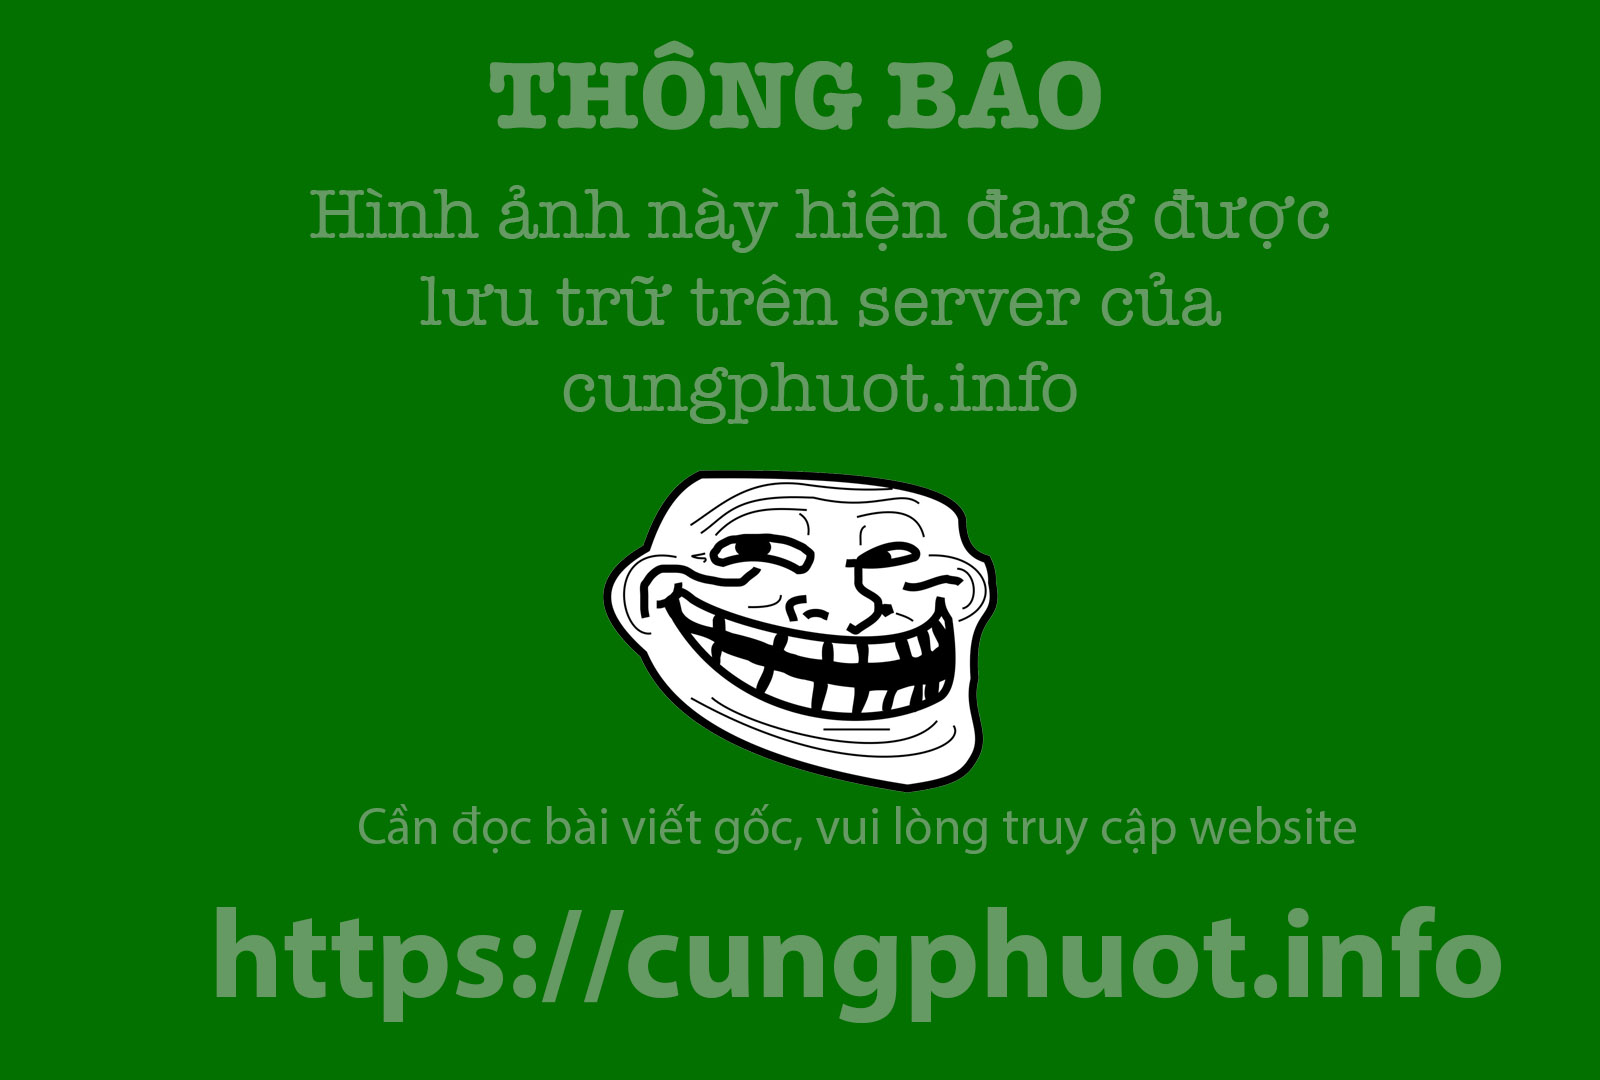 Chon bien cuong 'troi thap, dat cao' o Nam Can hinh anh 10